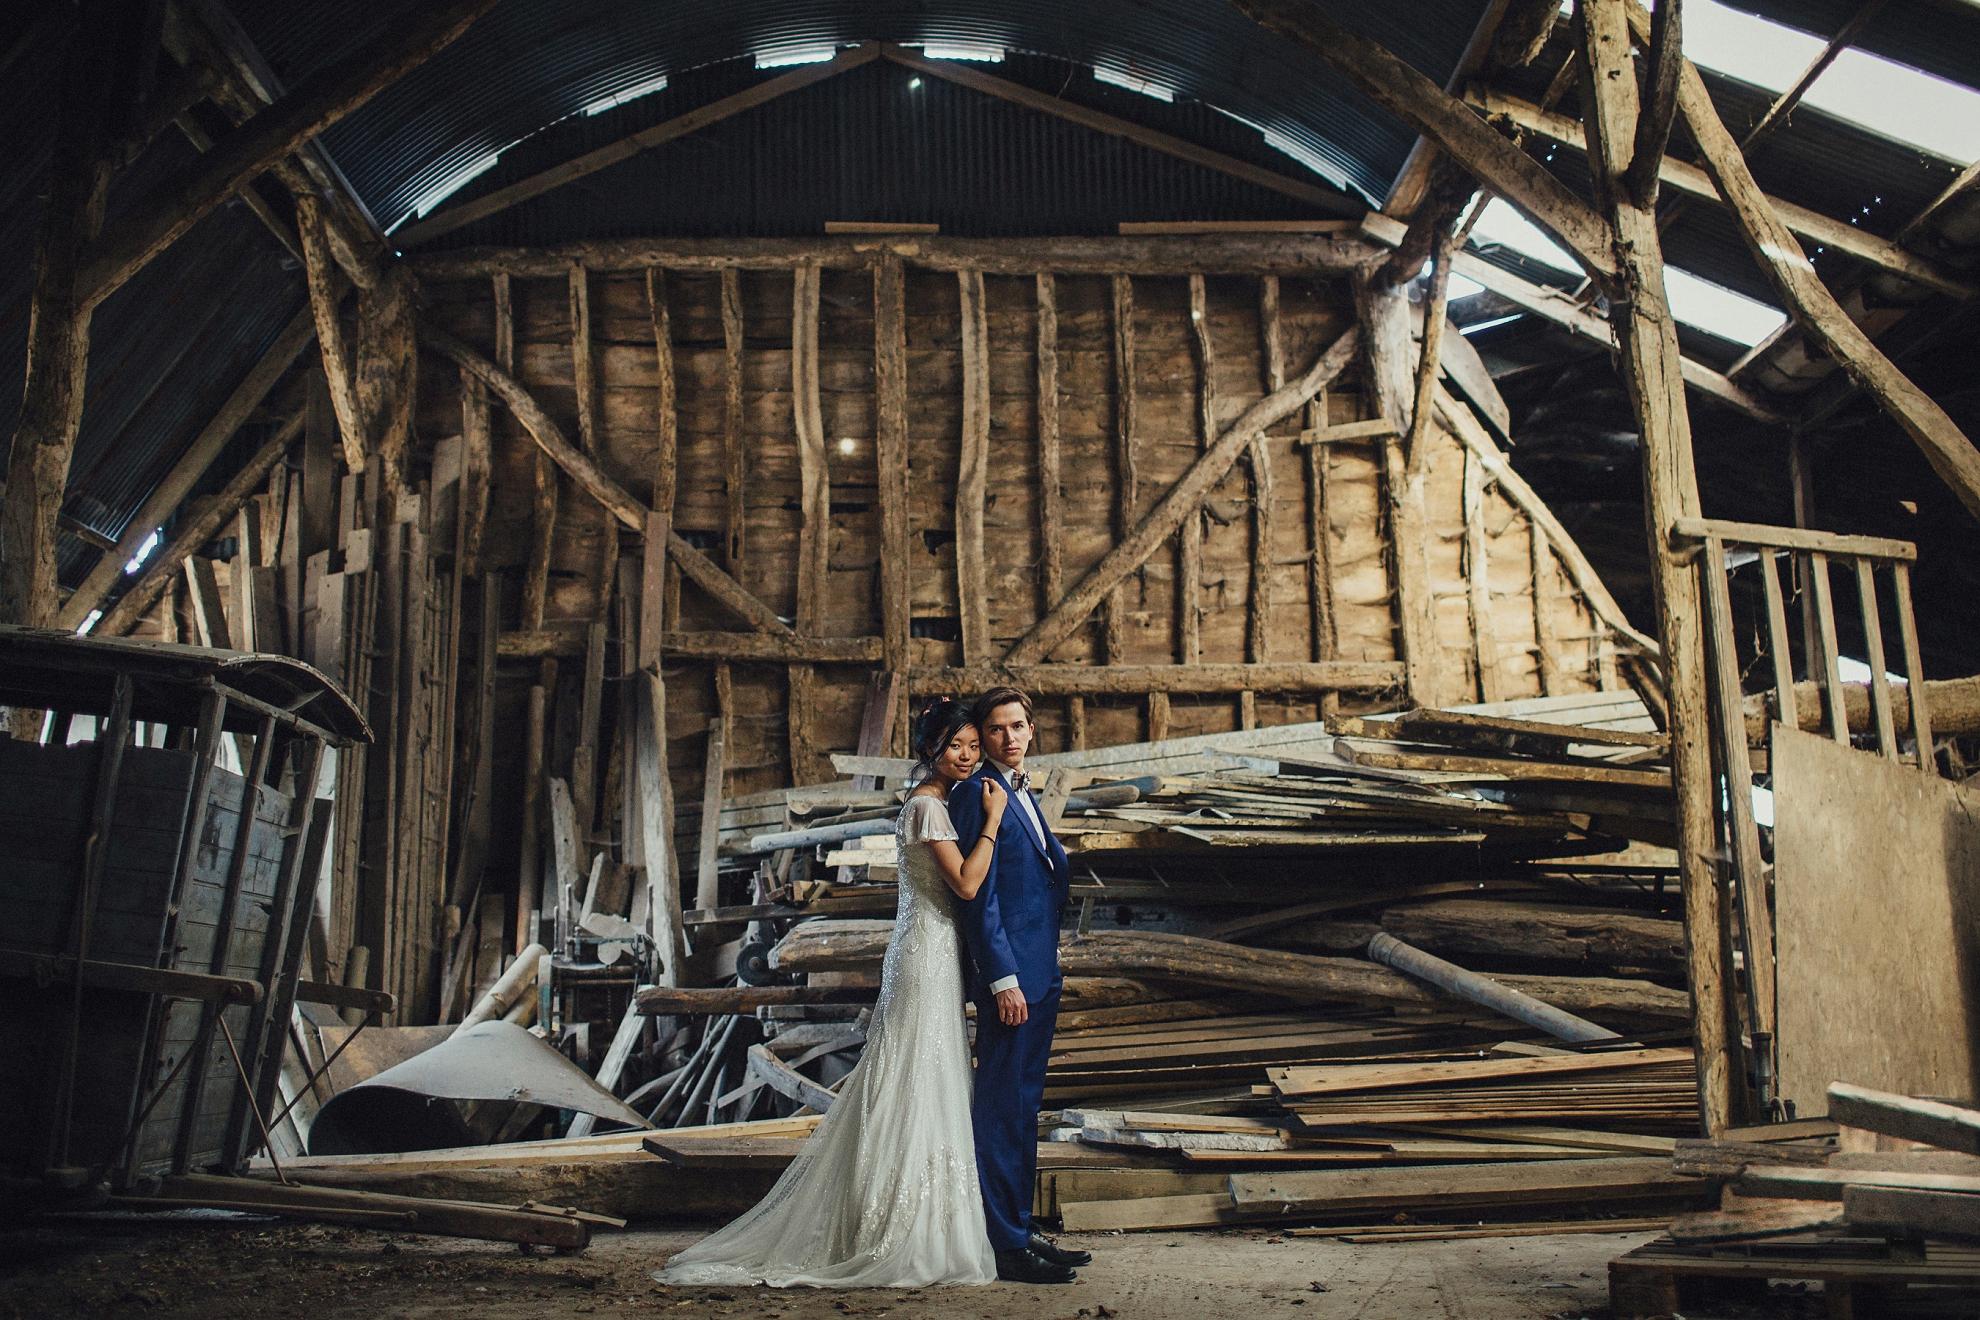 Manor barn weddings